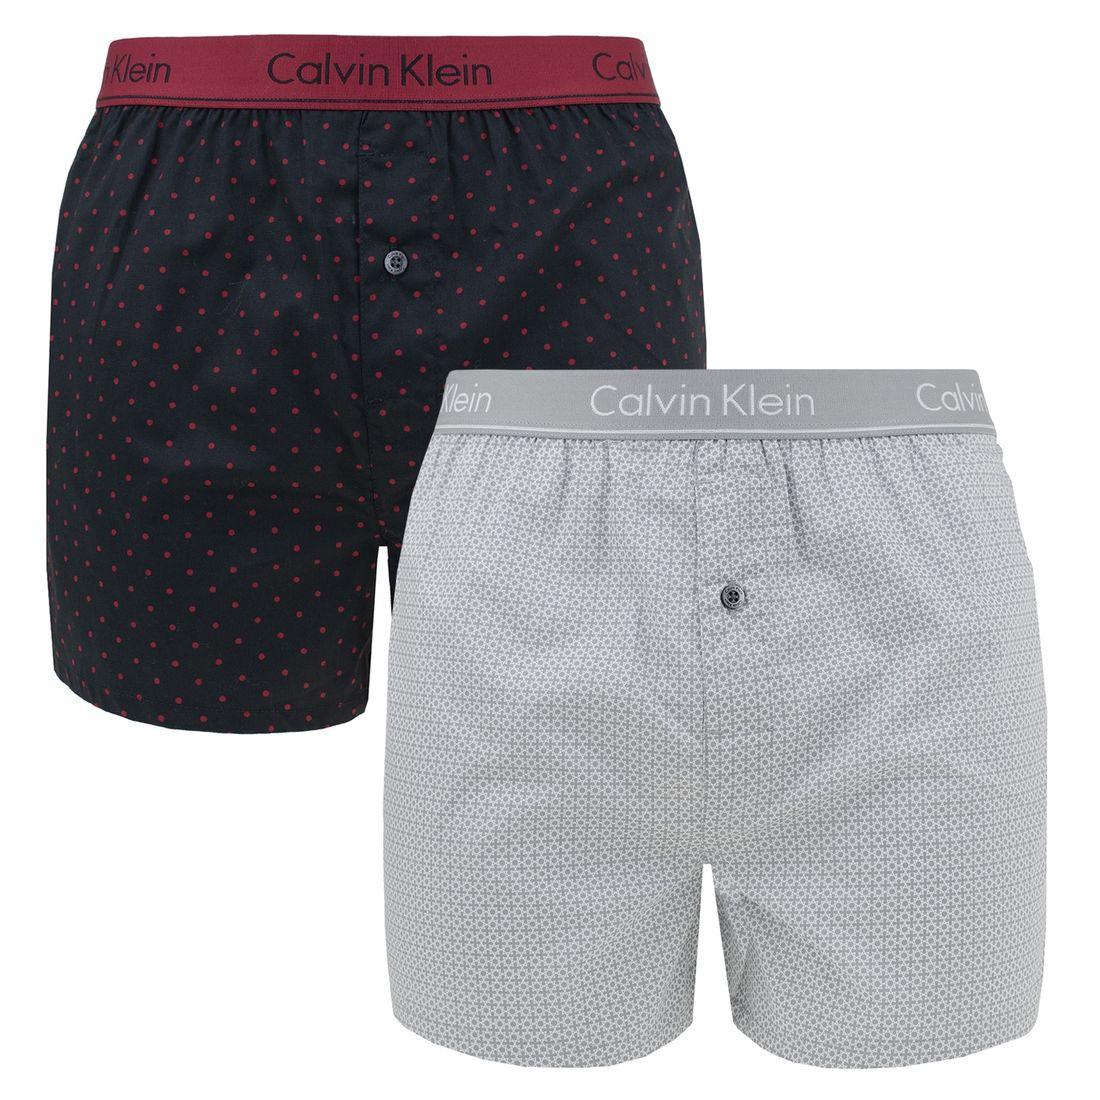 Afbeelding van Calvin Klein 2 pack slim fit boxer dots & plus heren